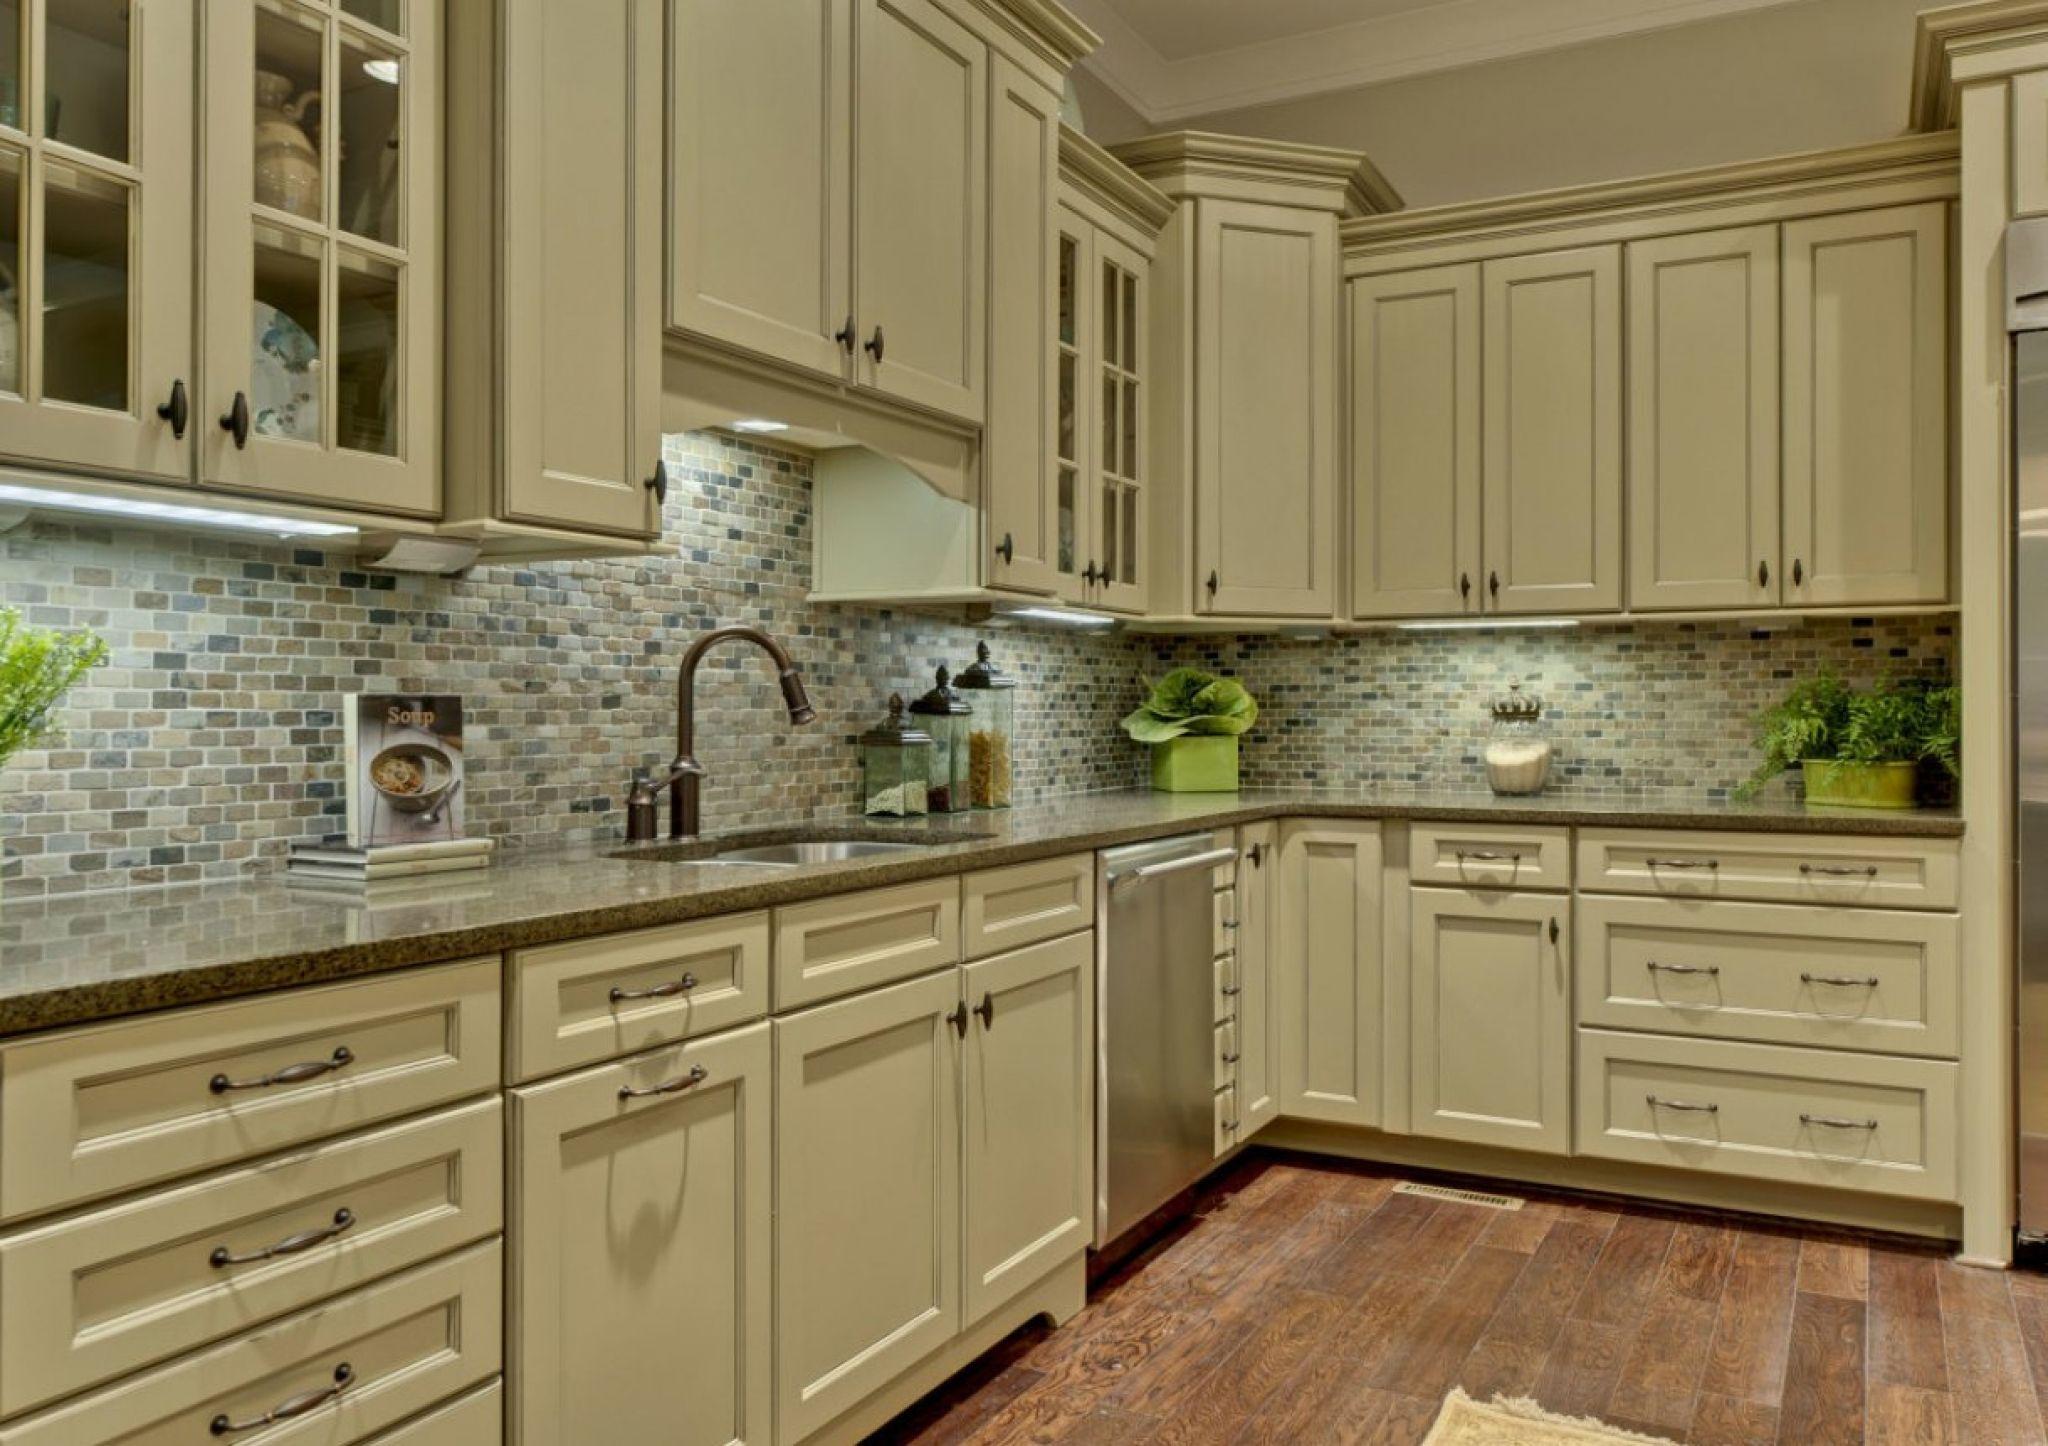 kitchen cabinets louisville ky - kitchen cabinets design ideas Check ...